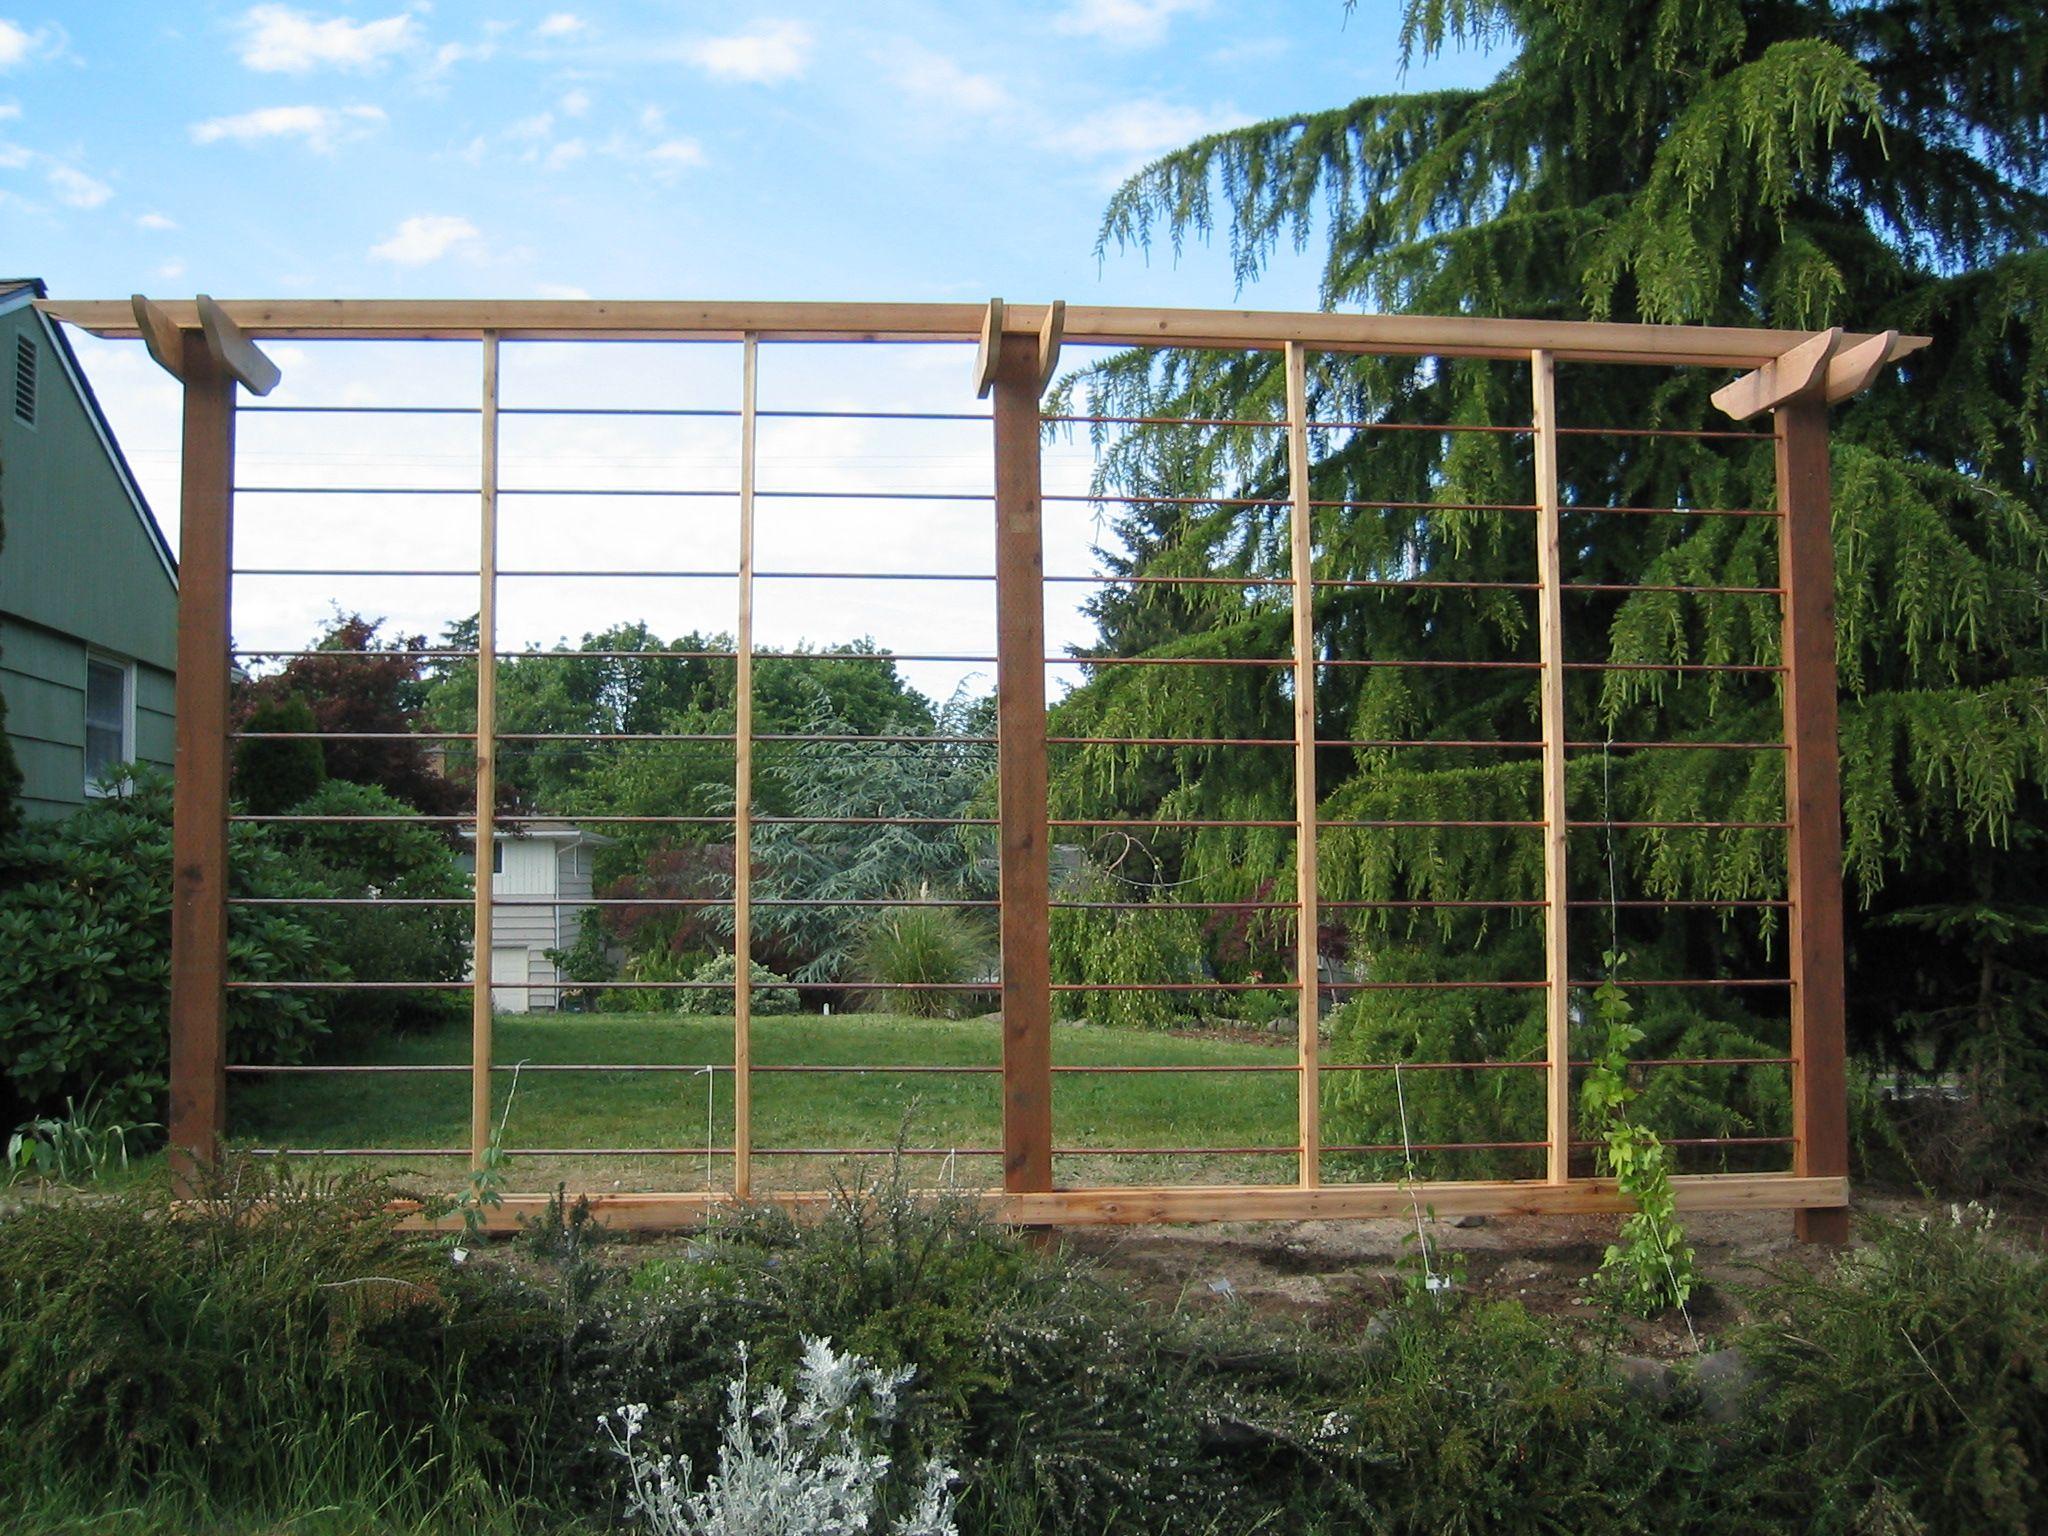 Superb Hop Trellis Ideas Part - 5: Garden Ideas · Hops Trellis